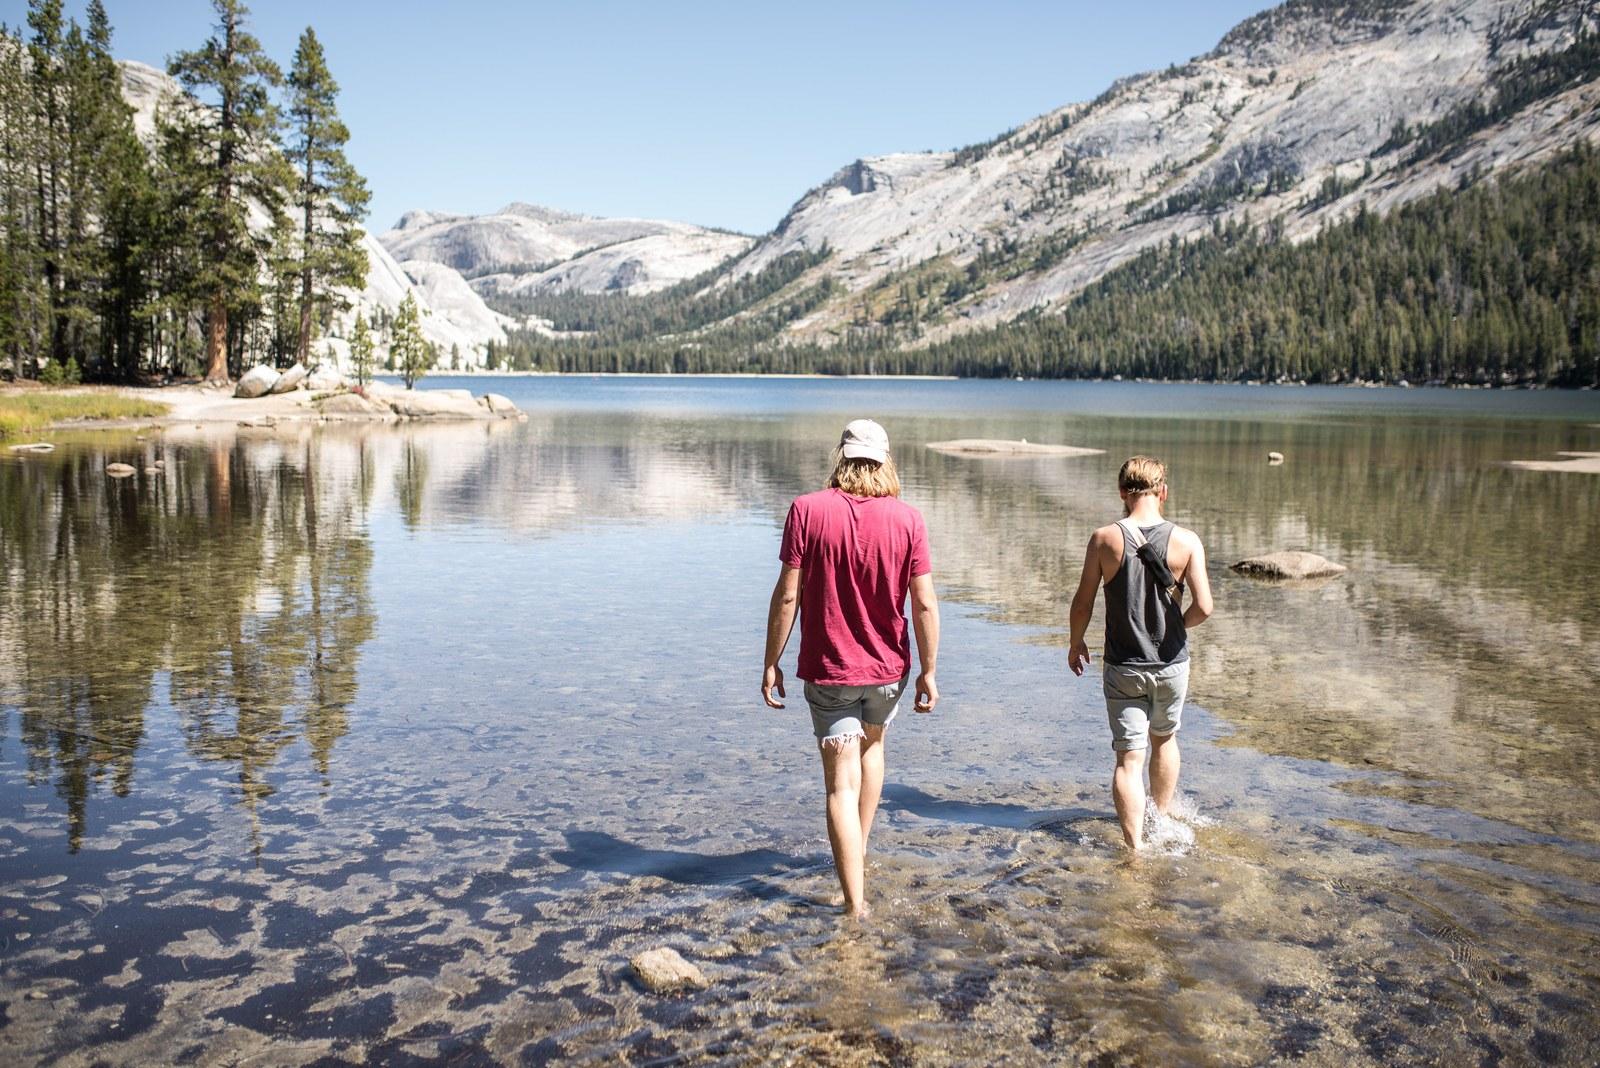 Mirror Lake, Snow Creek Trail Yosemite